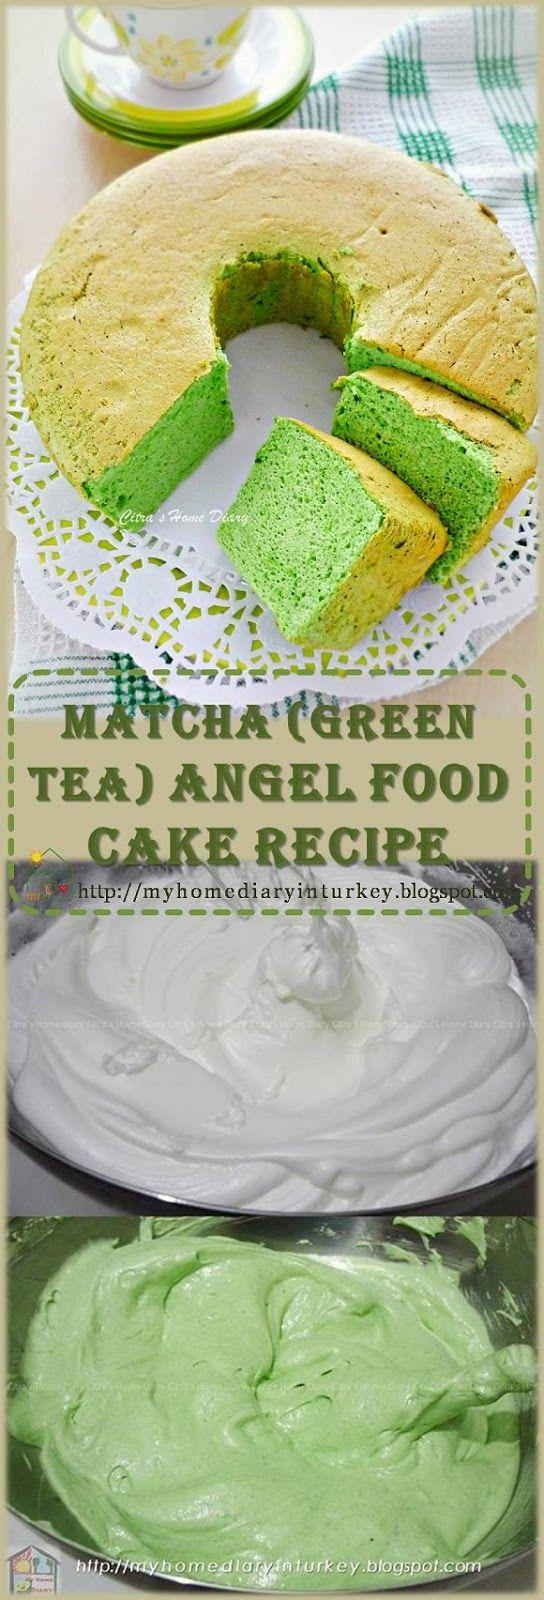 Matcha (Green tea) angel food cake recipe / Resep Matcha Angel food (cake dari putih telur). #resepputihtelur #angelfoodcake #eggwhiterecipe #matcha #greentea #dessertcake #greencakeidea